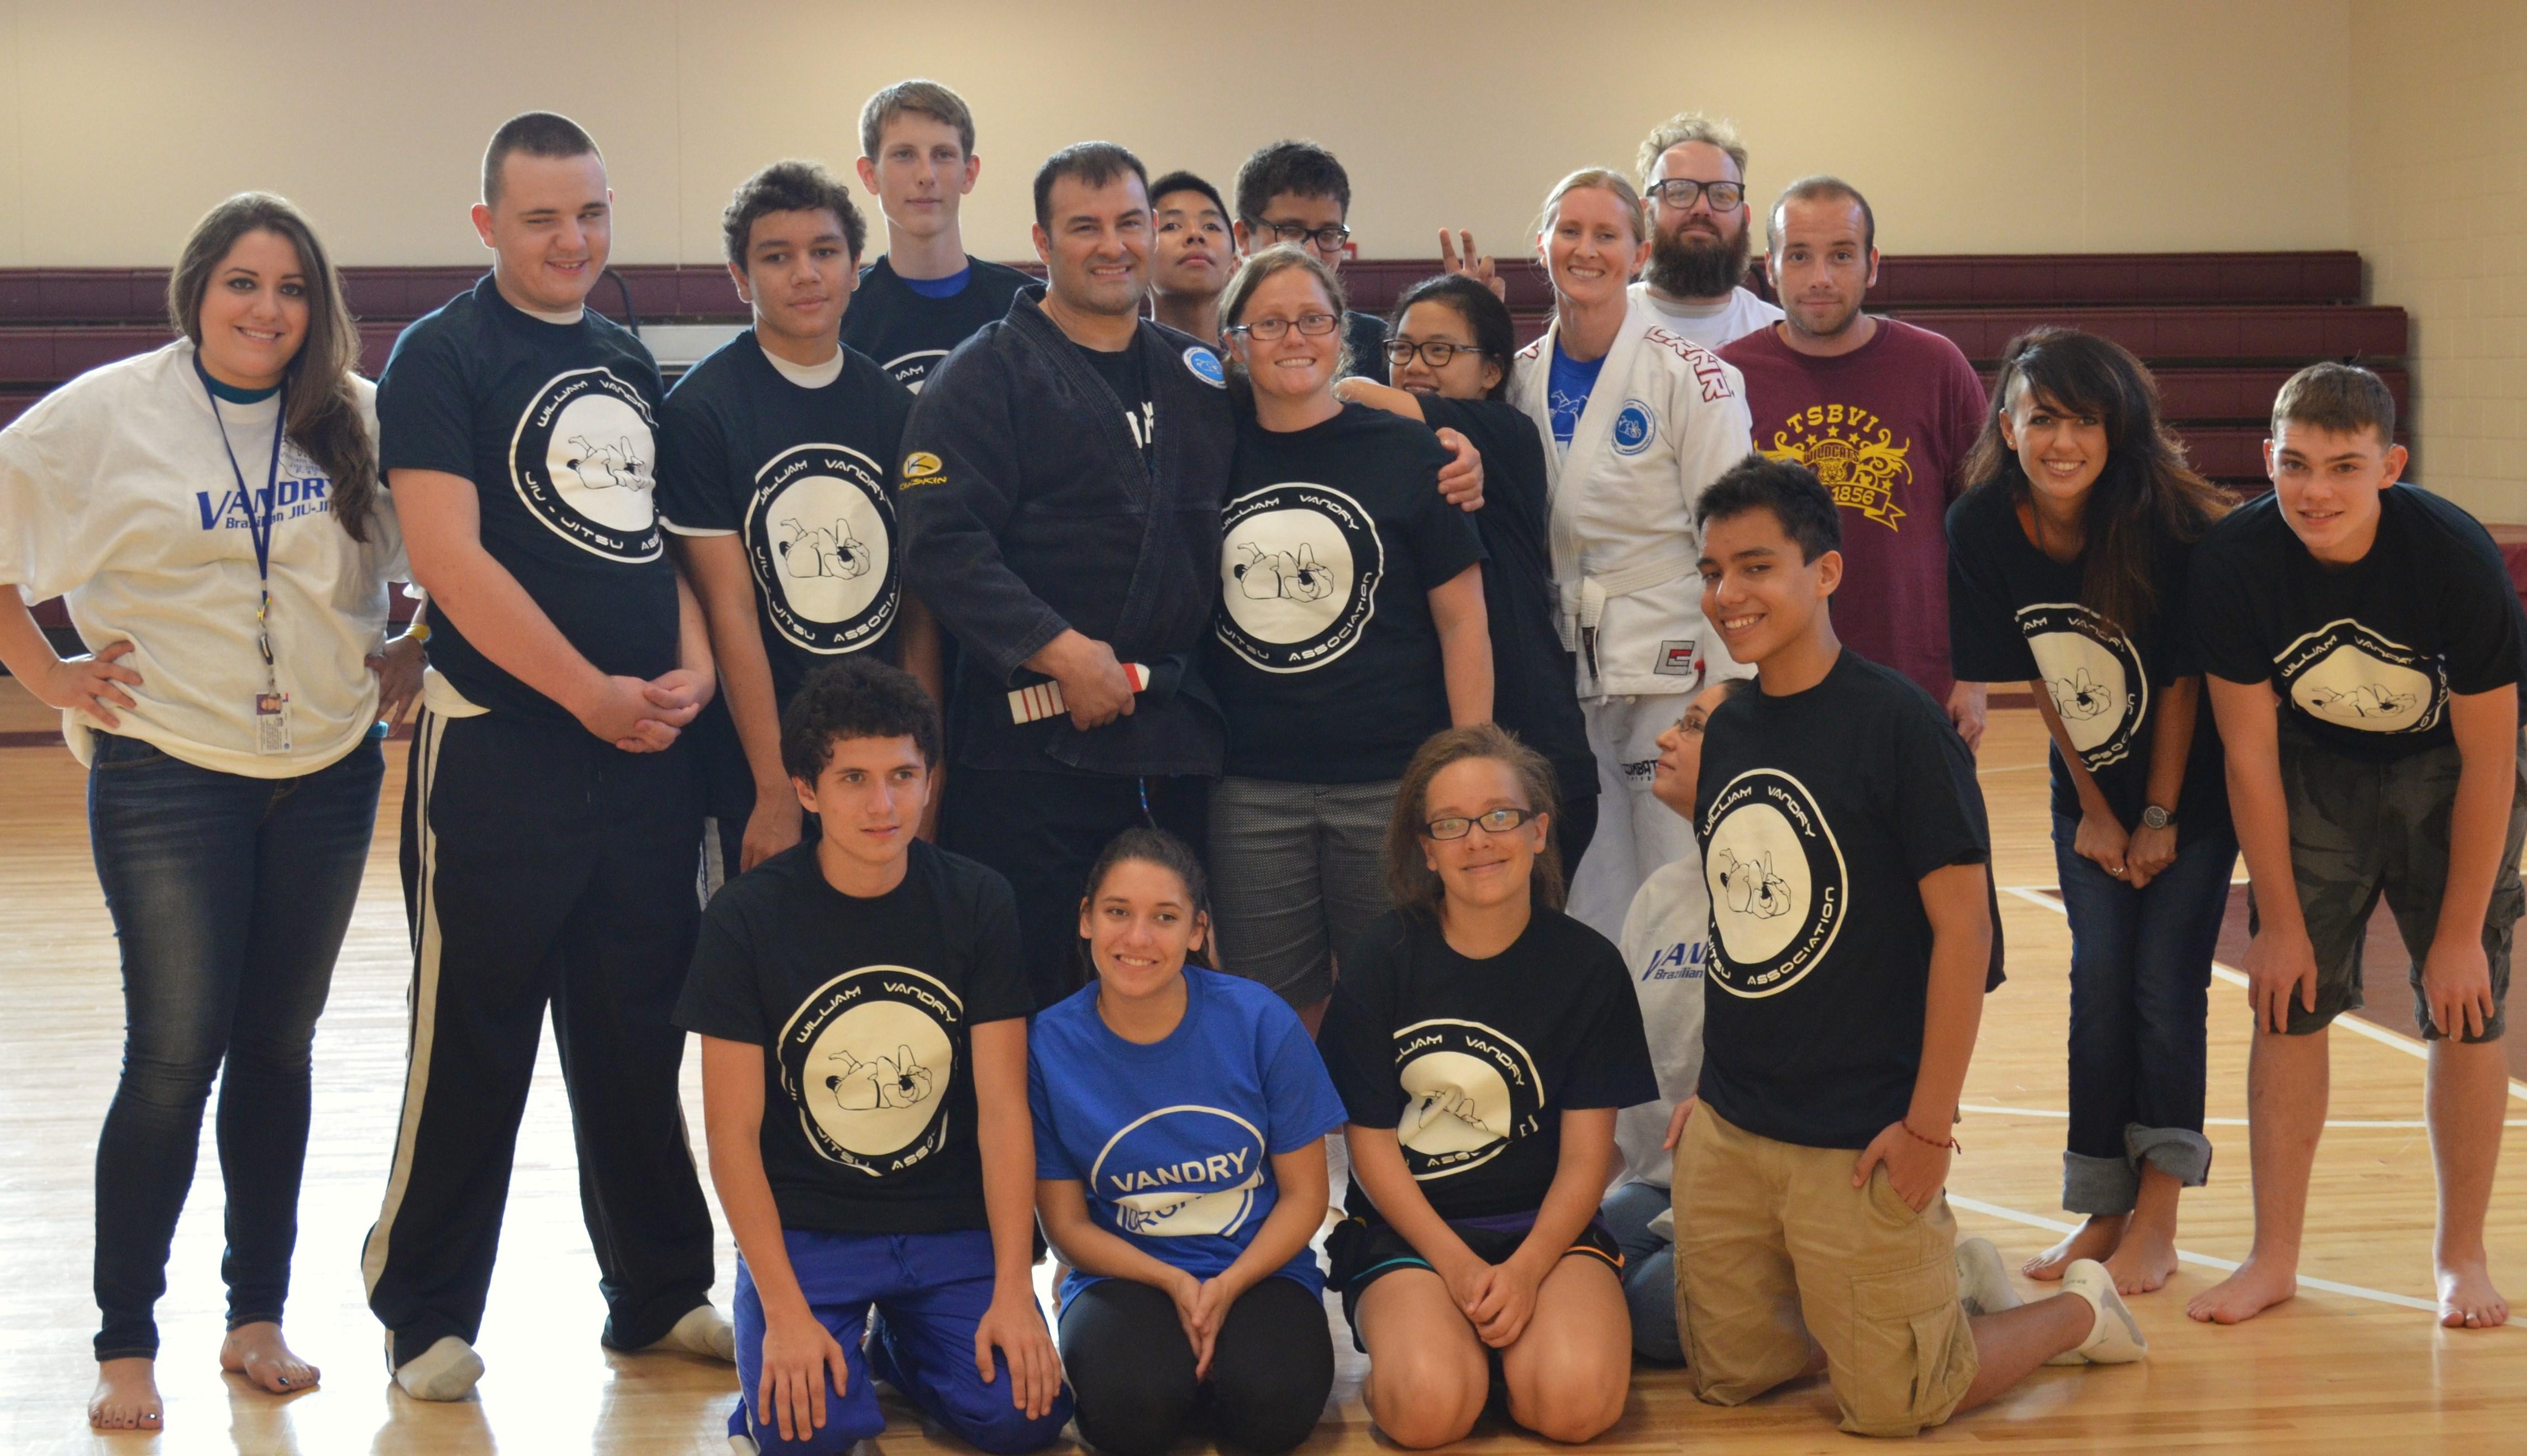 William Vandry William Vandry School of the Blind Jiu jitsu camp